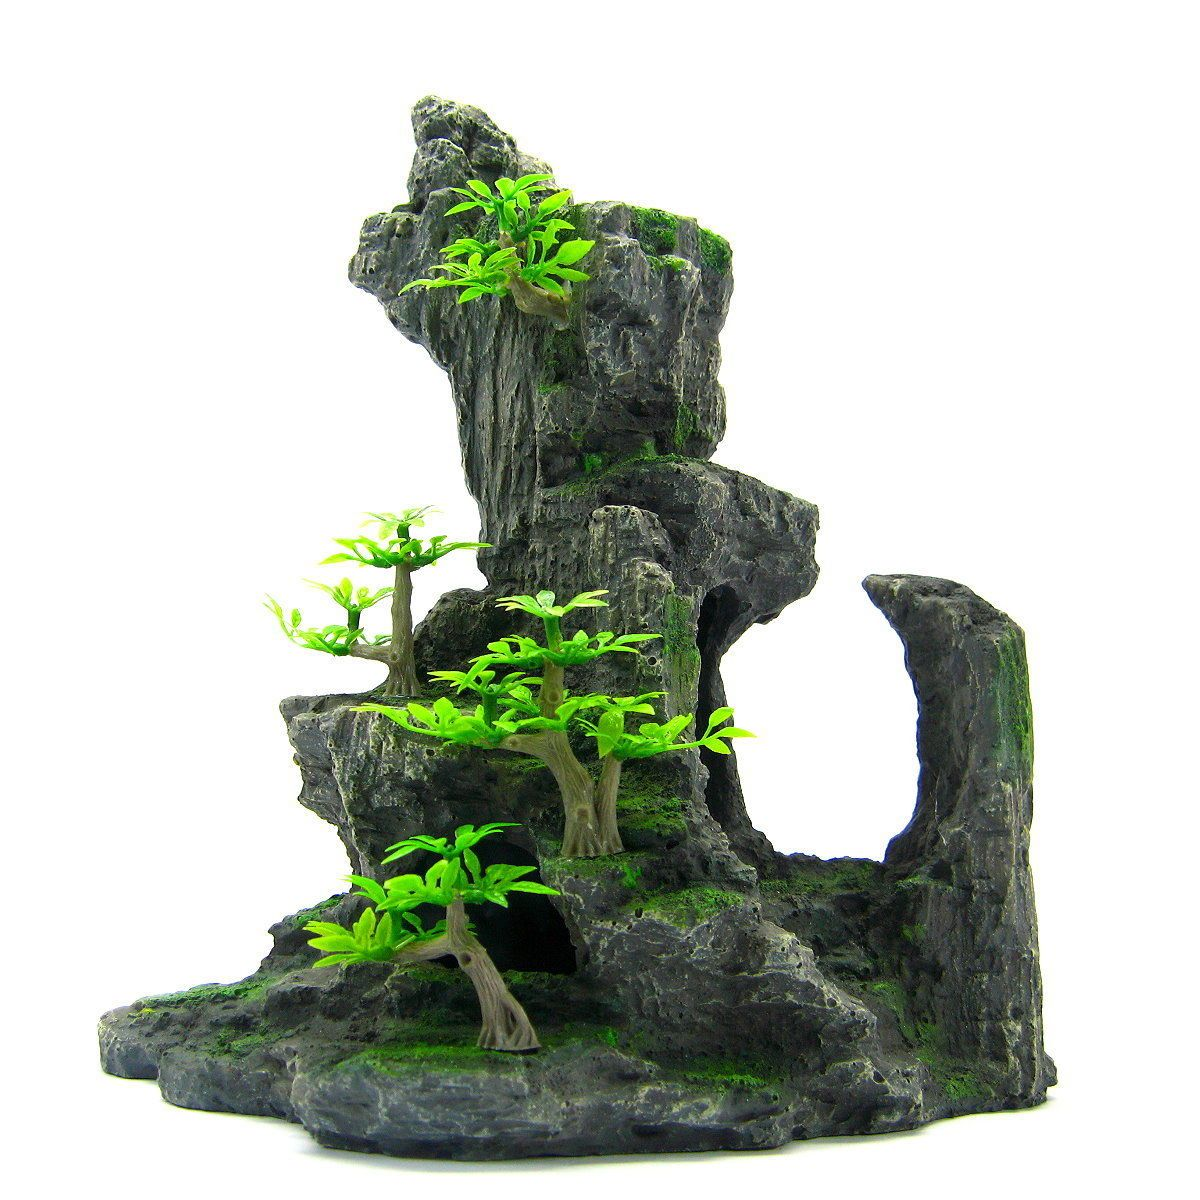 Aquarium fish tank ebay - Mountain View Aquarium Ornament Tree 21x11cm Rock Bonsai Decoration Fish Tank Ebay